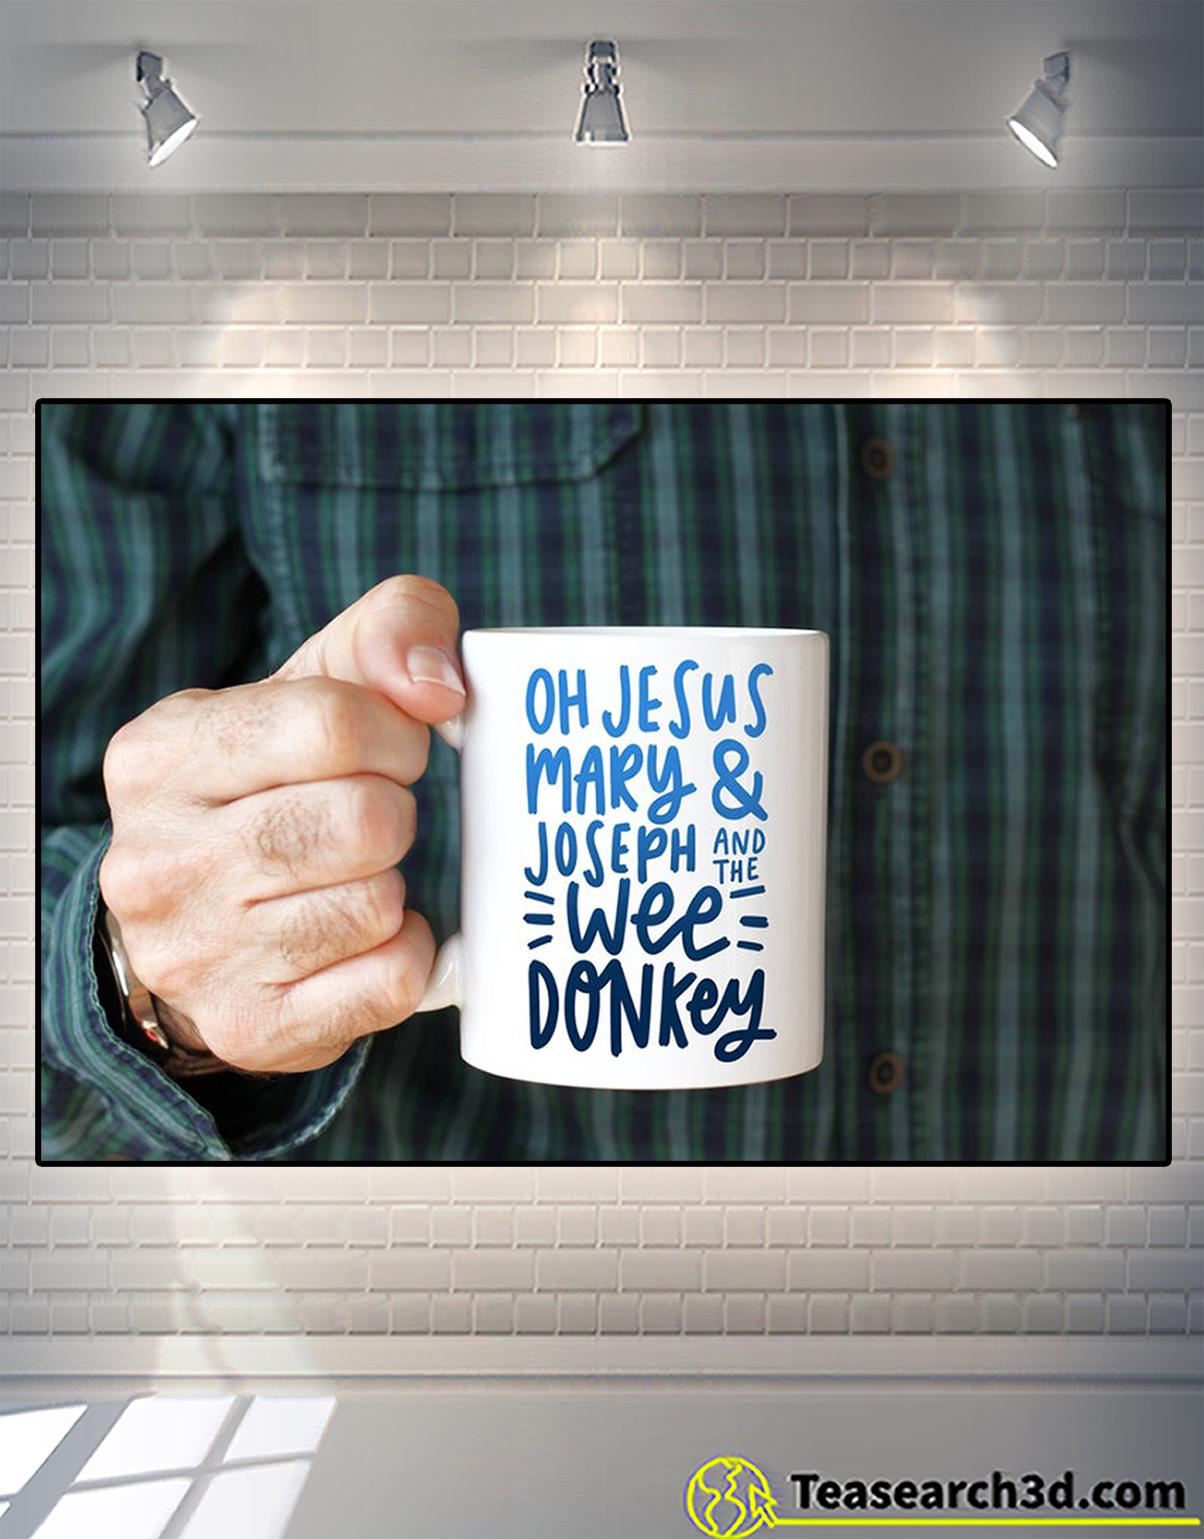 Oh jesus mary and joseph and the wee donkey mug 2